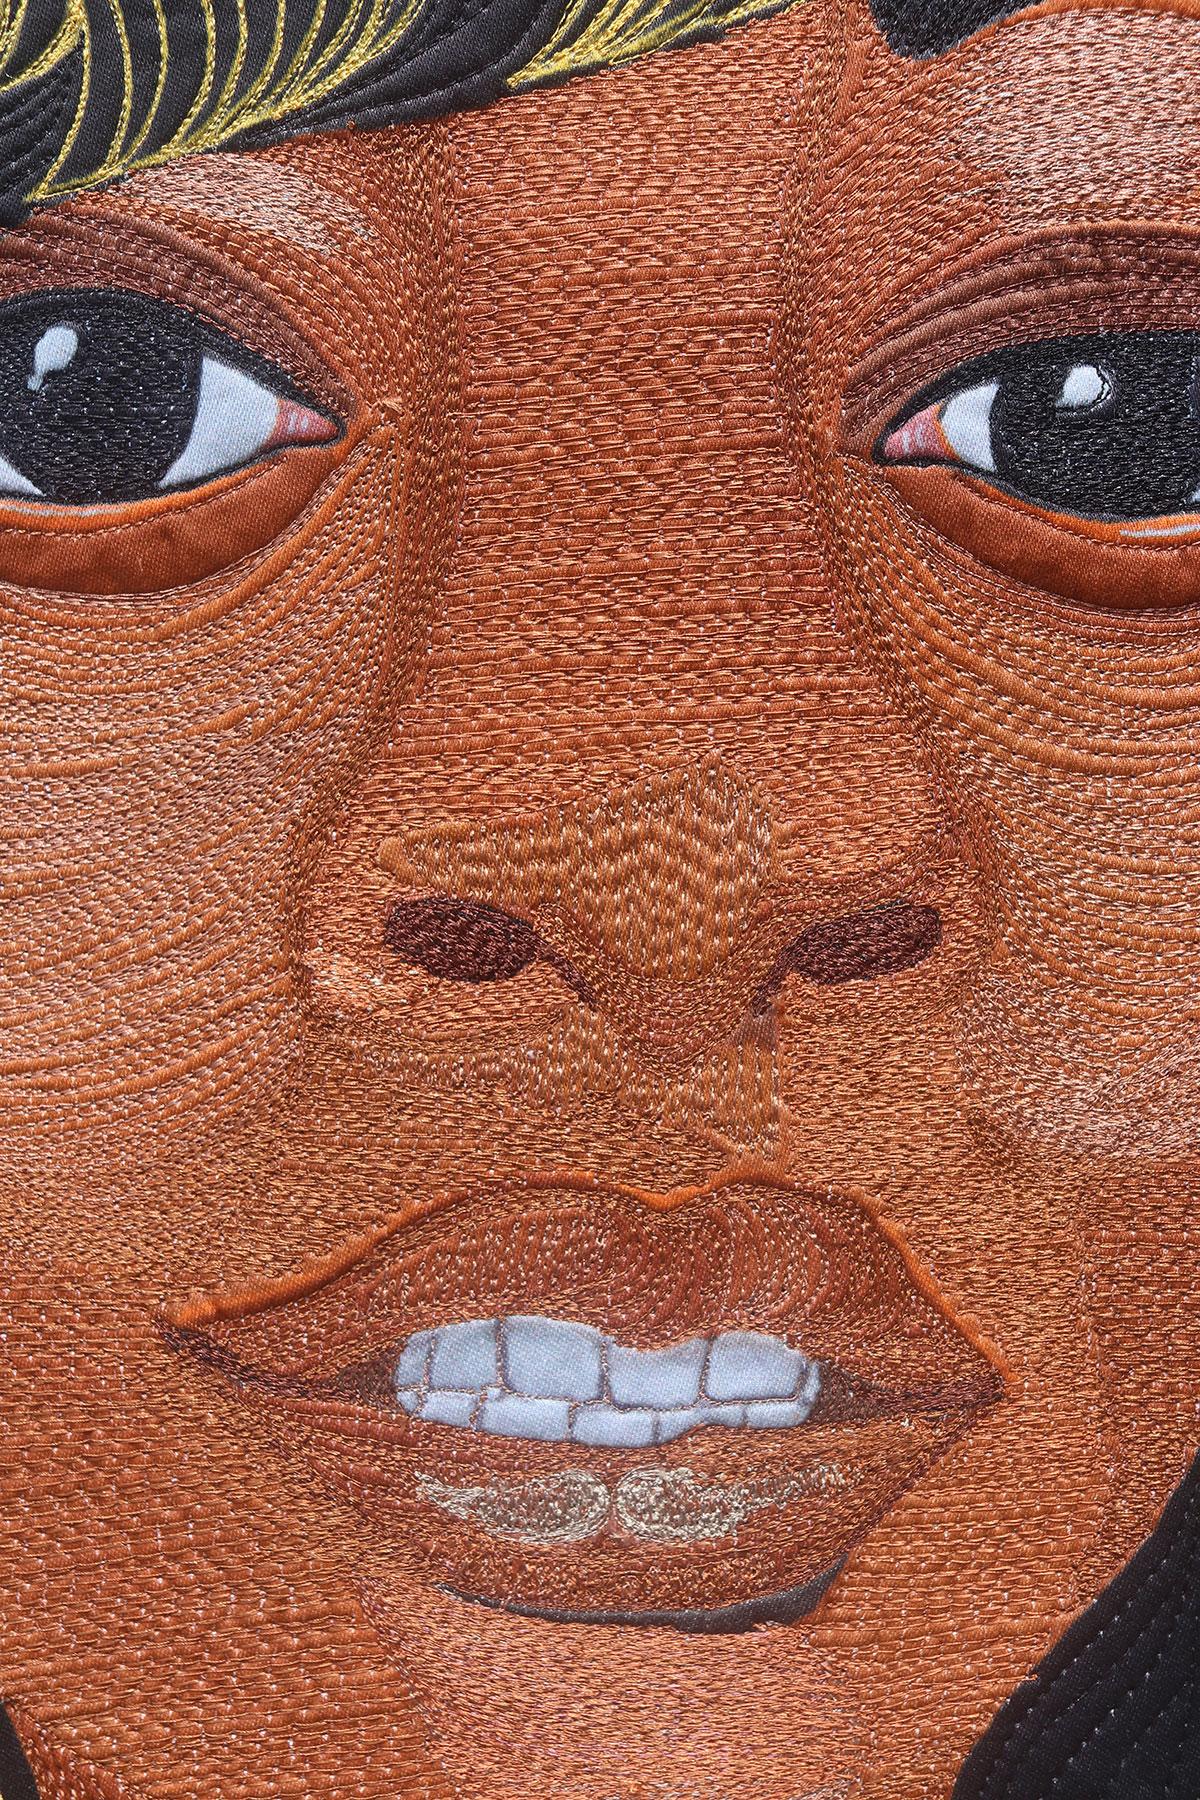 Charleena Lyles | Fiber Art | Thread Painting | Textile Art | Art Quilt | #CharleenaLyles